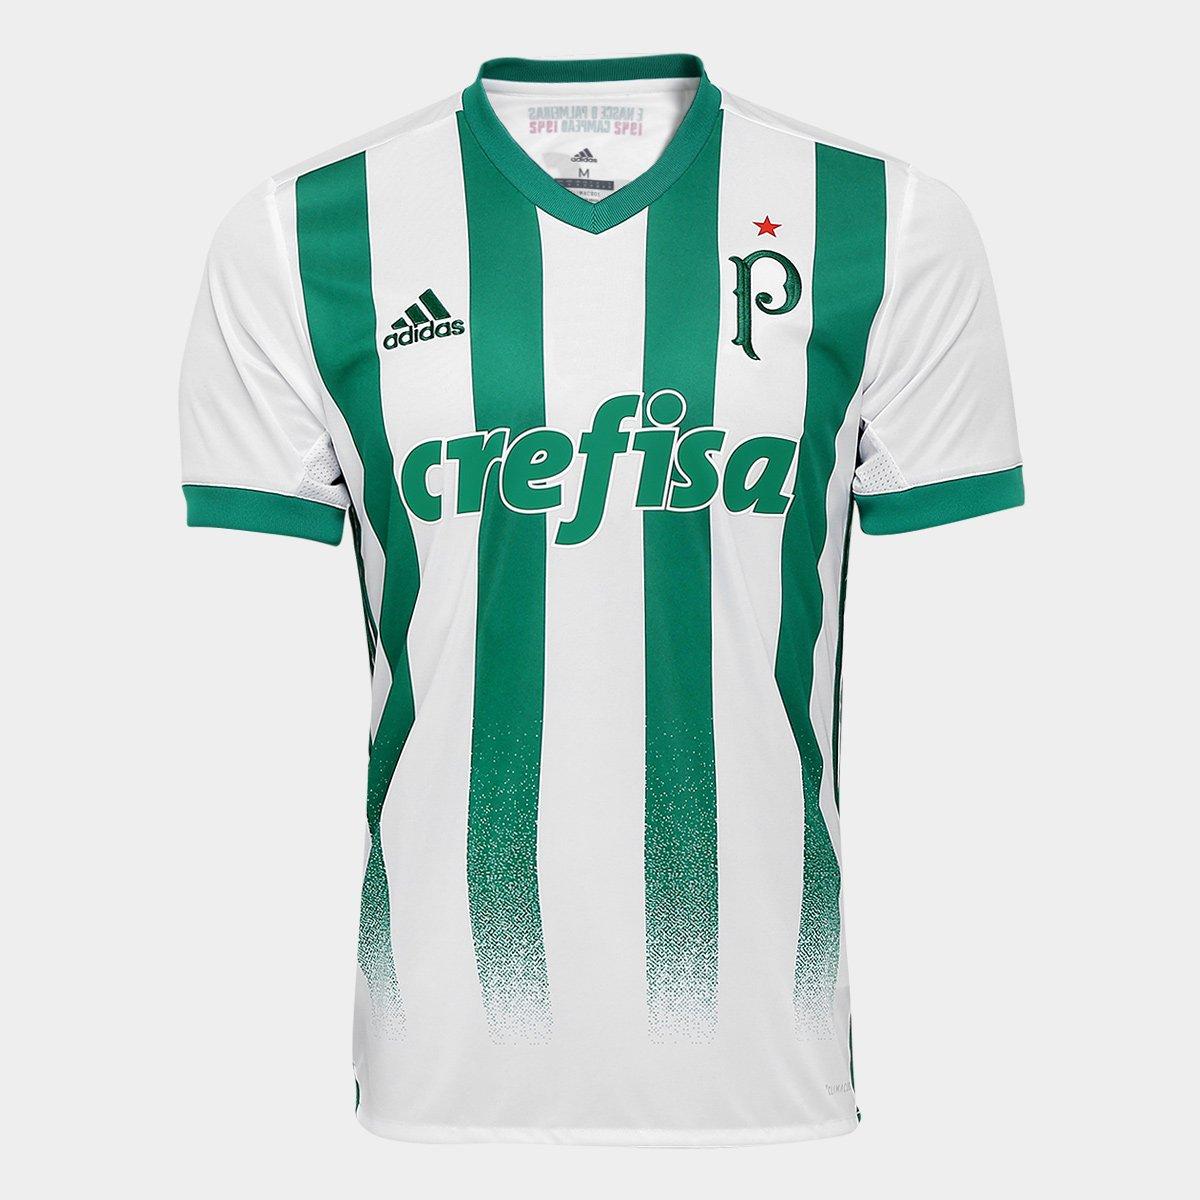 731a3bd7cb Camisa Palmeiras II 17 18 S Nº Mundial de 1951 Torcedor Adidas Masculina -  Compre Agora